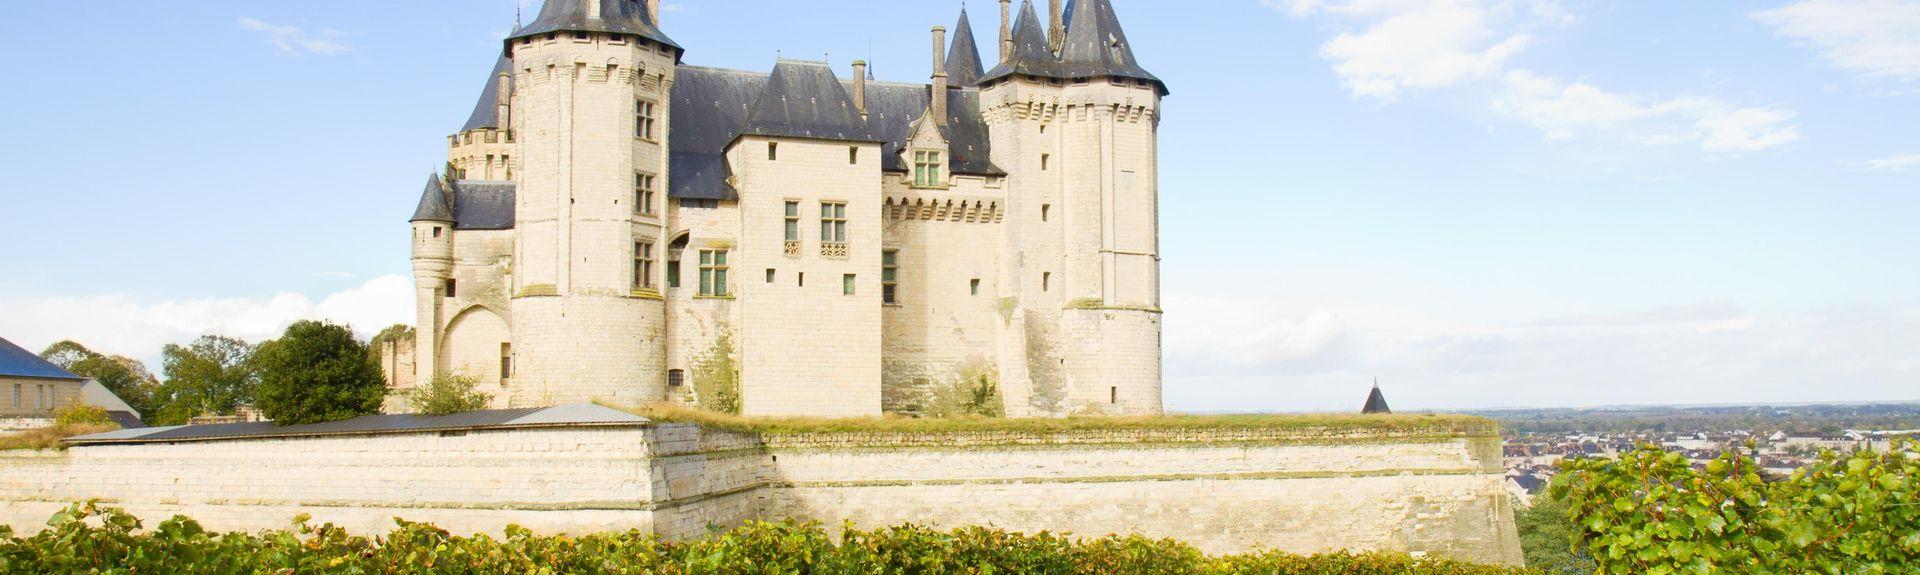 Château de Saumur, Saumur, Pays de la Loire, Frankrijk